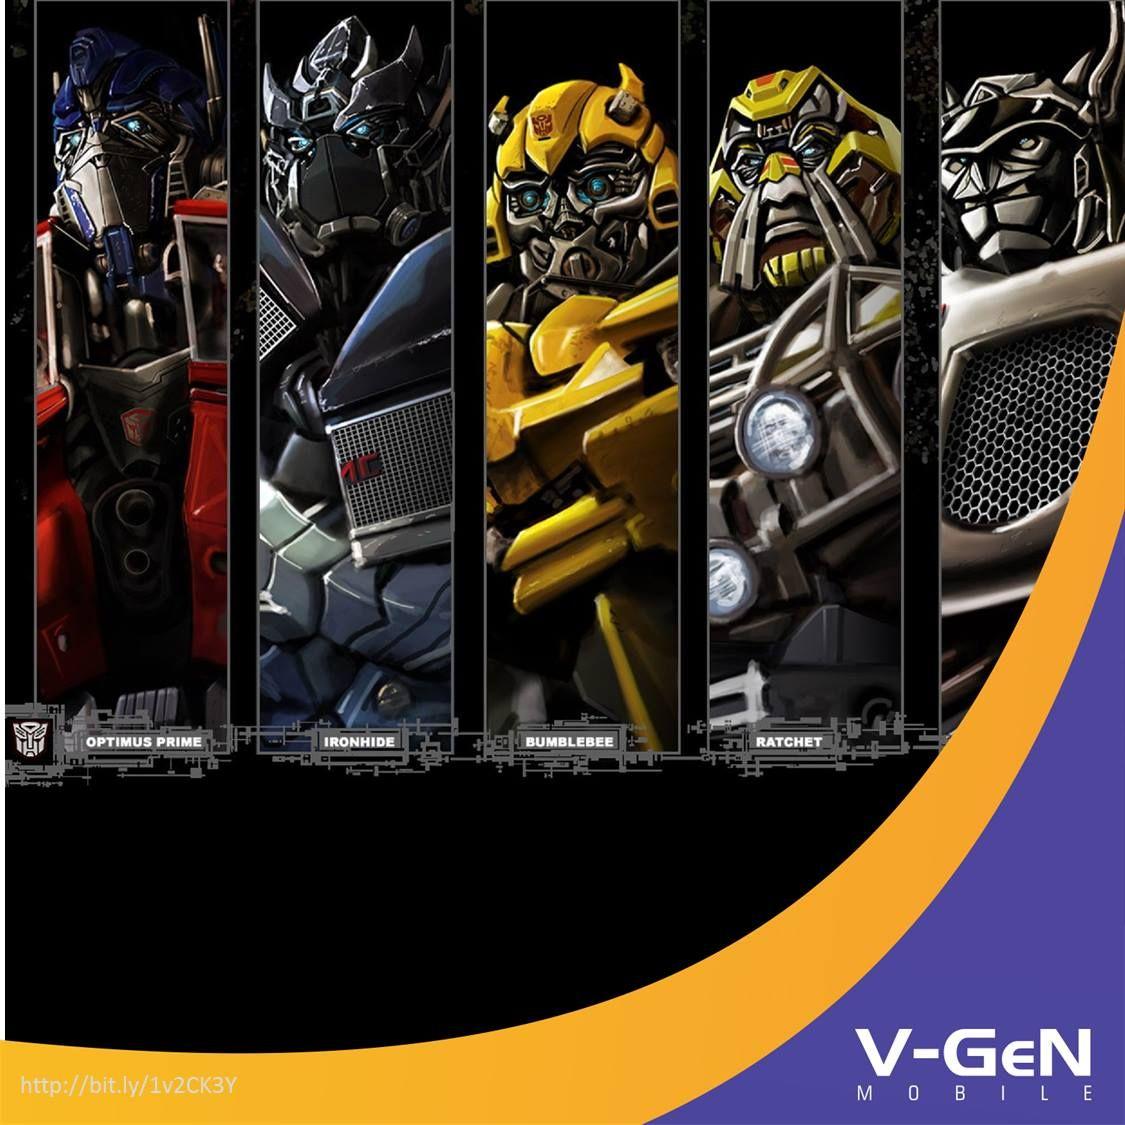 Suka Dengan Film Transformers Kabarnya Bakalan Ada 2 Karakter